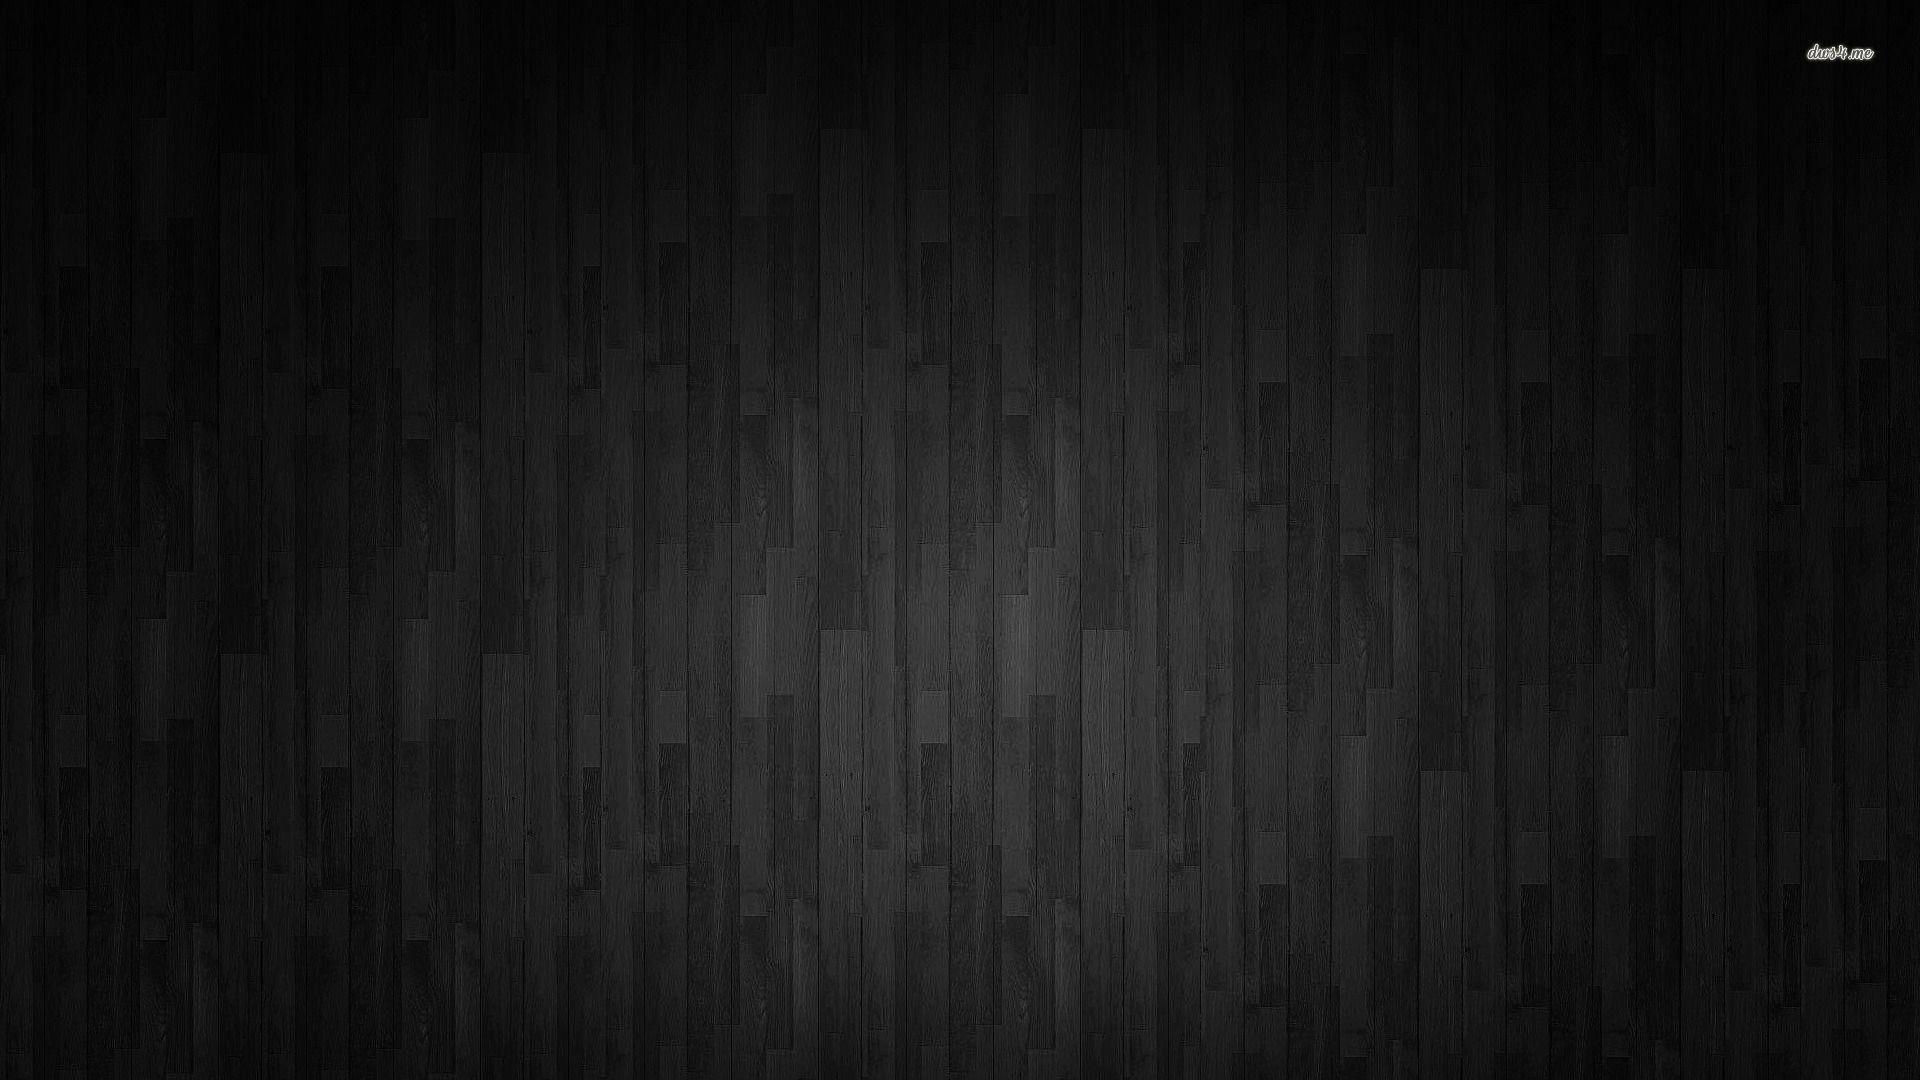 Wallpaper Pattern Image Colony 1920—1080 Wallpaper Pattern 26